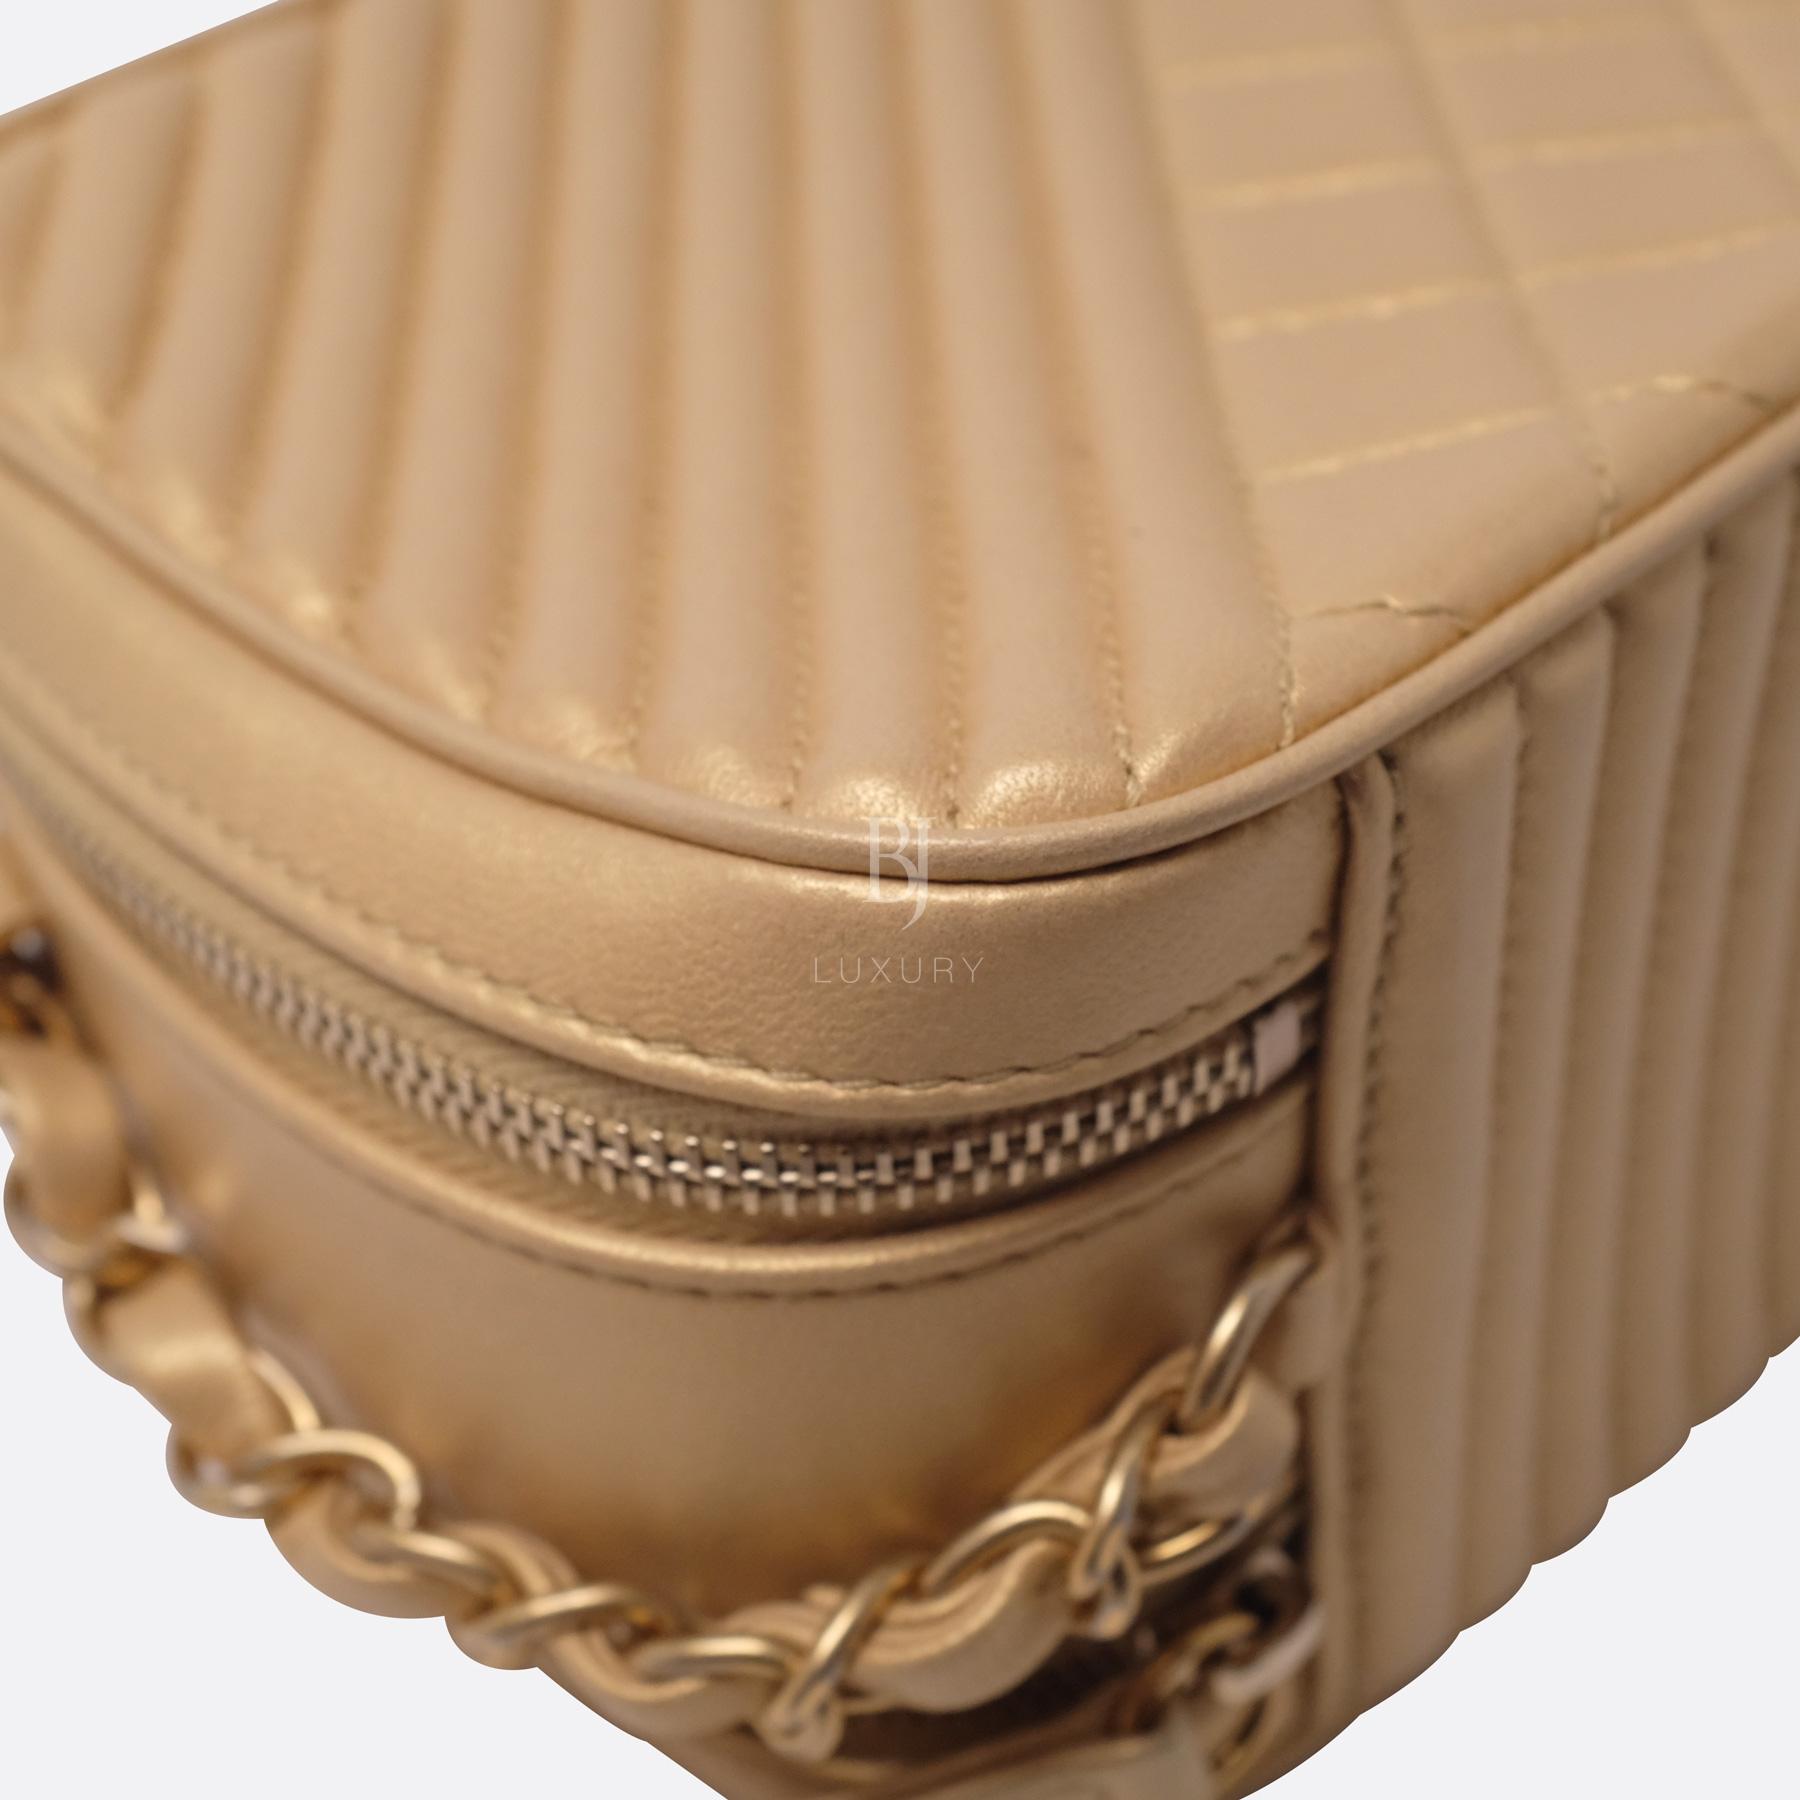 Chanel Camera Case Medium Brushed Gold Calf Gold BJ Luxury 14.jpg